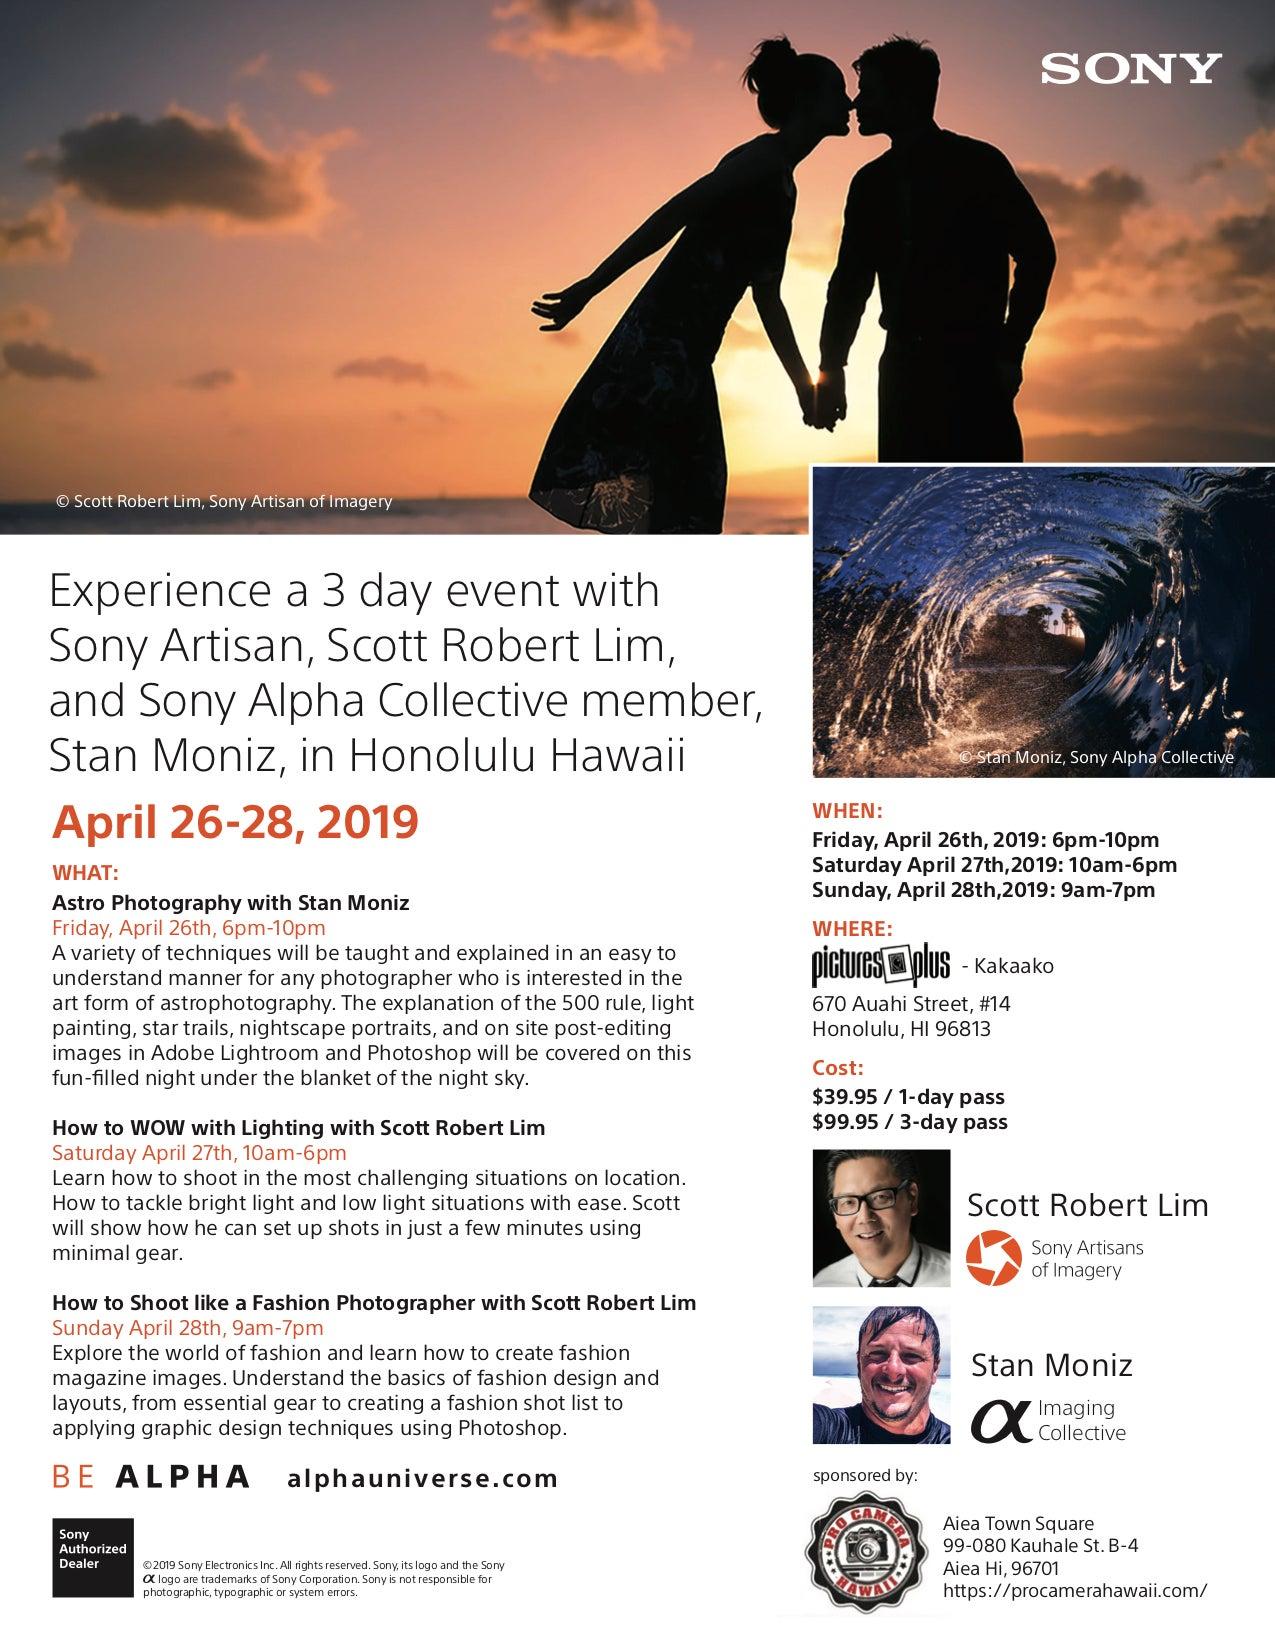 Be Alpha Hawaii 3-Day Event With Stan Moniz And Scott Robert